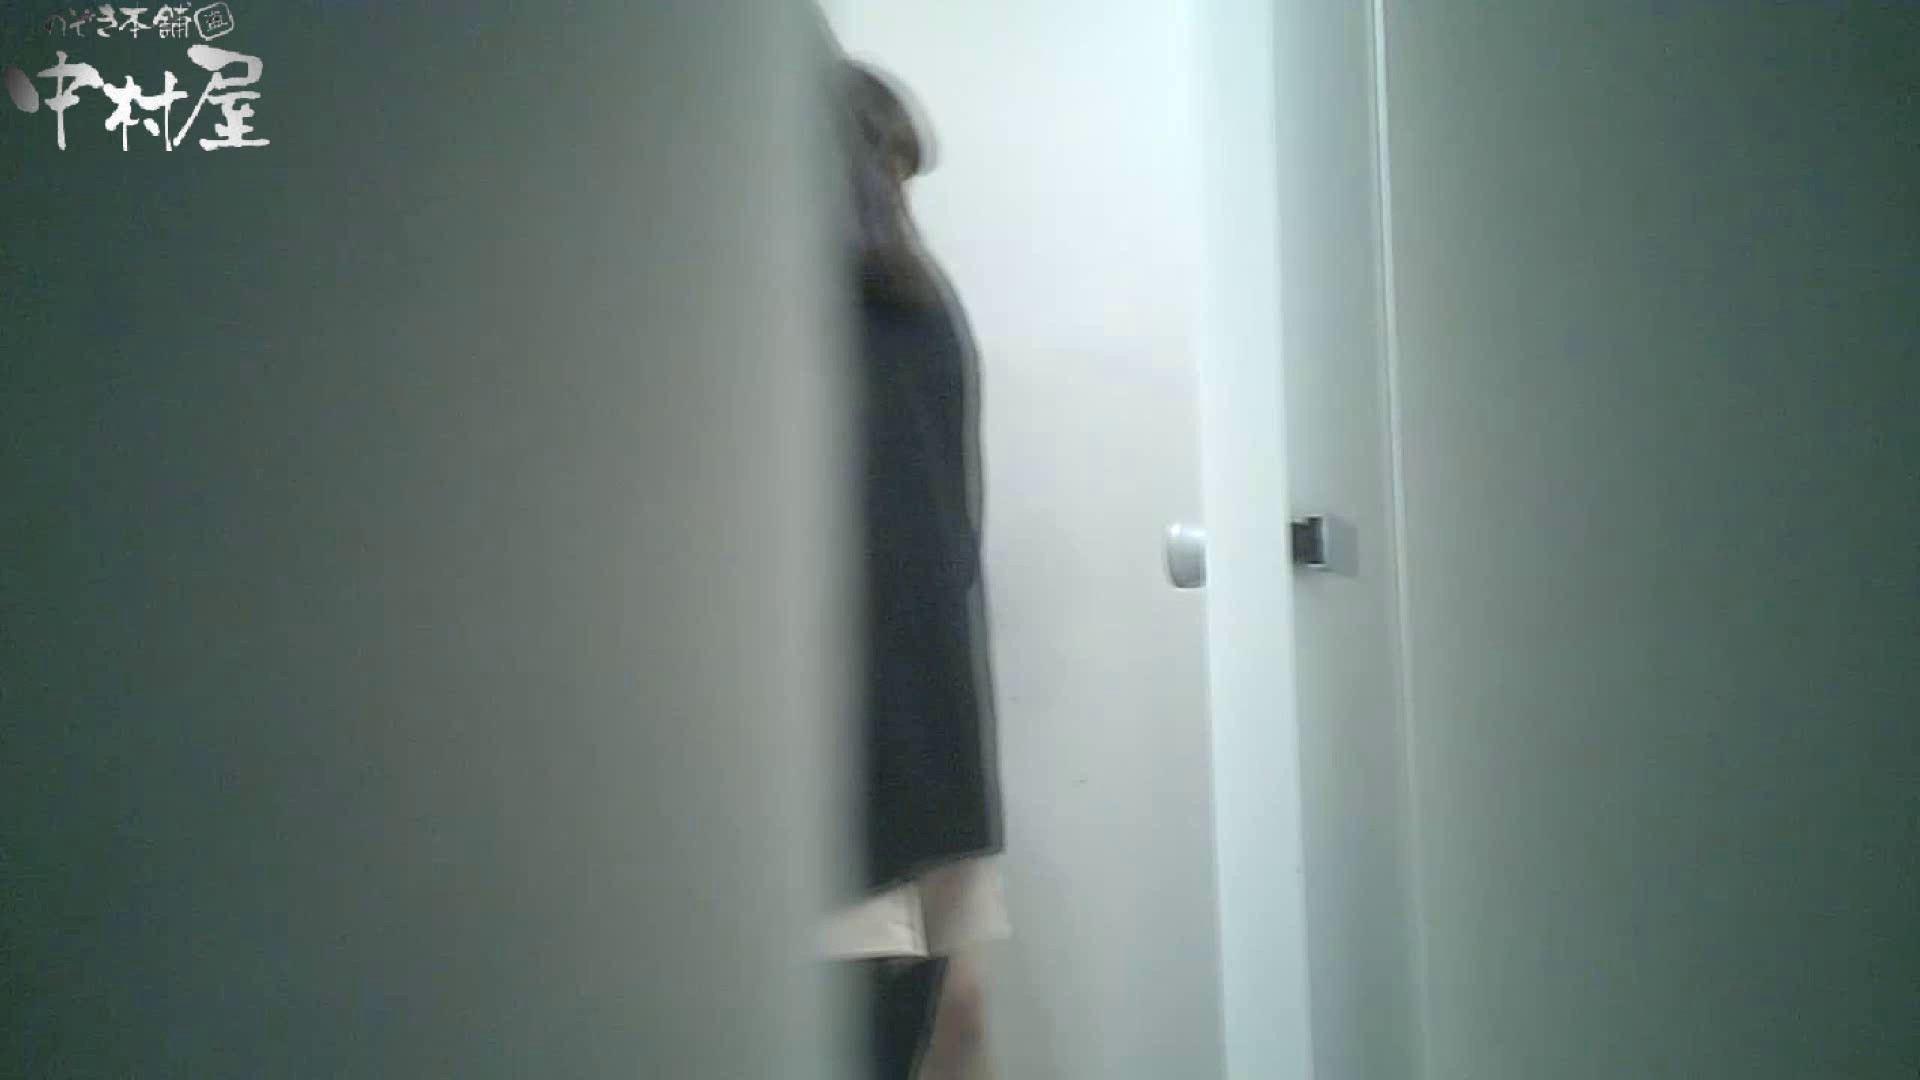 【某有名大学女性洗面所】有名大学女性洗面所 vol.35 安定の2カメ 最近の女性は保守的な下着が多め? 下着   潜入画像  83画像 8